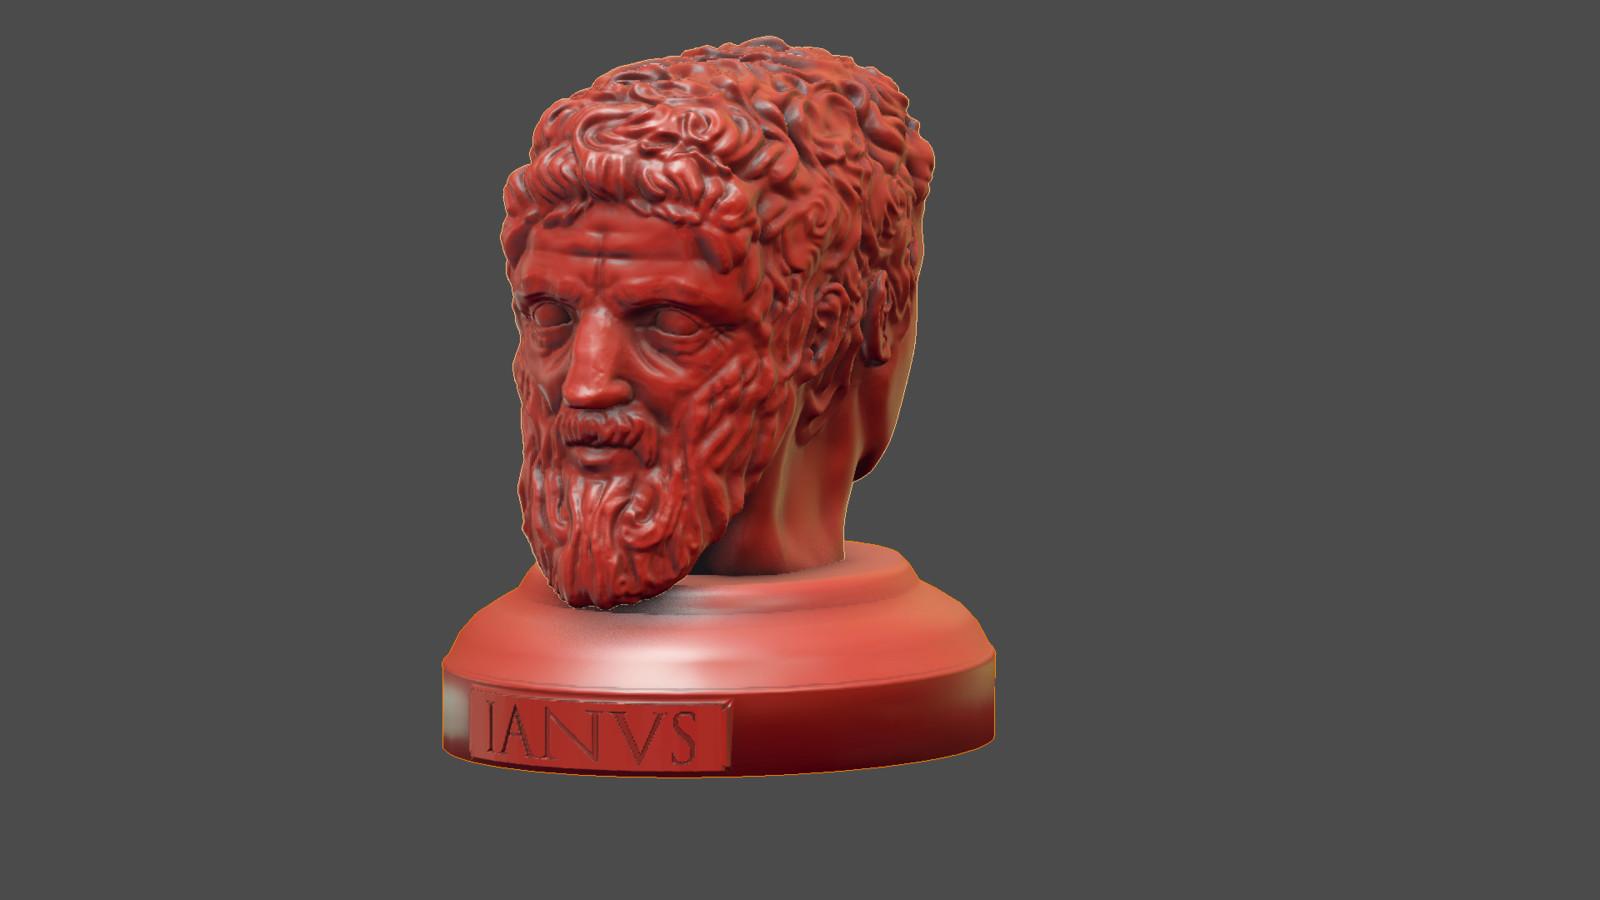 Janus the old